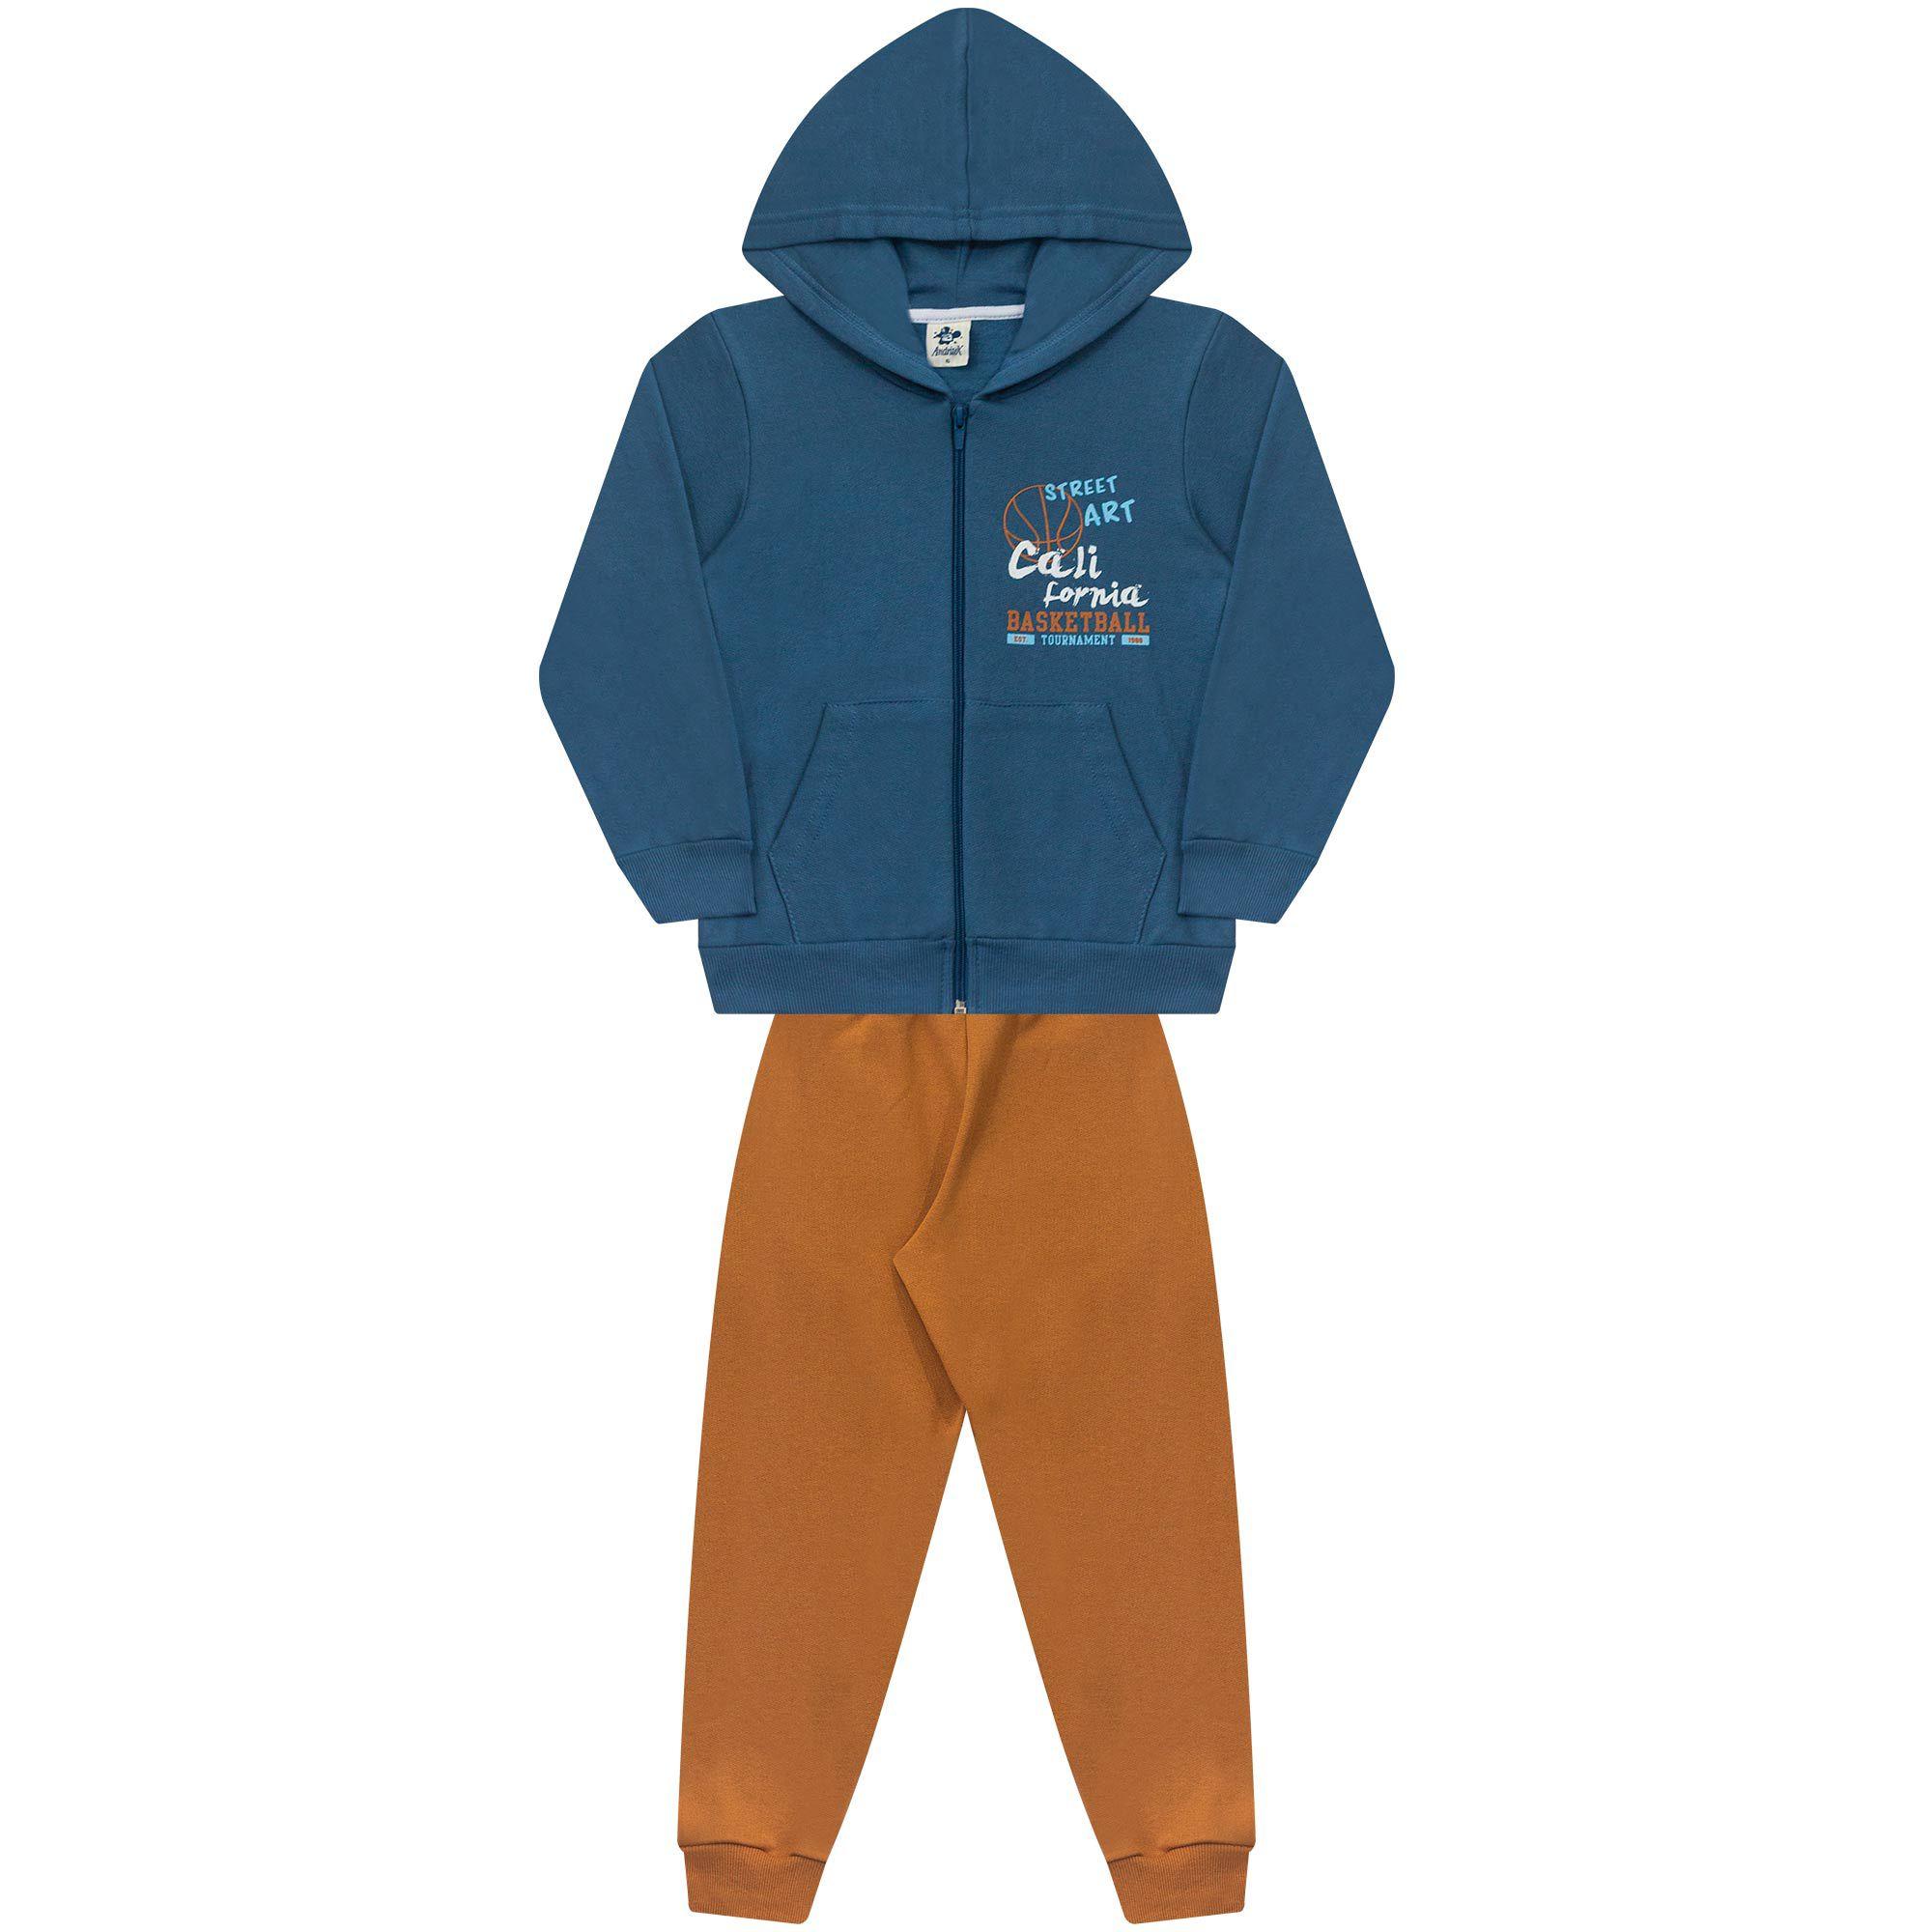 Conjunto Infantil Masculino  - Ref 5015 - Diadema/Amêndoa